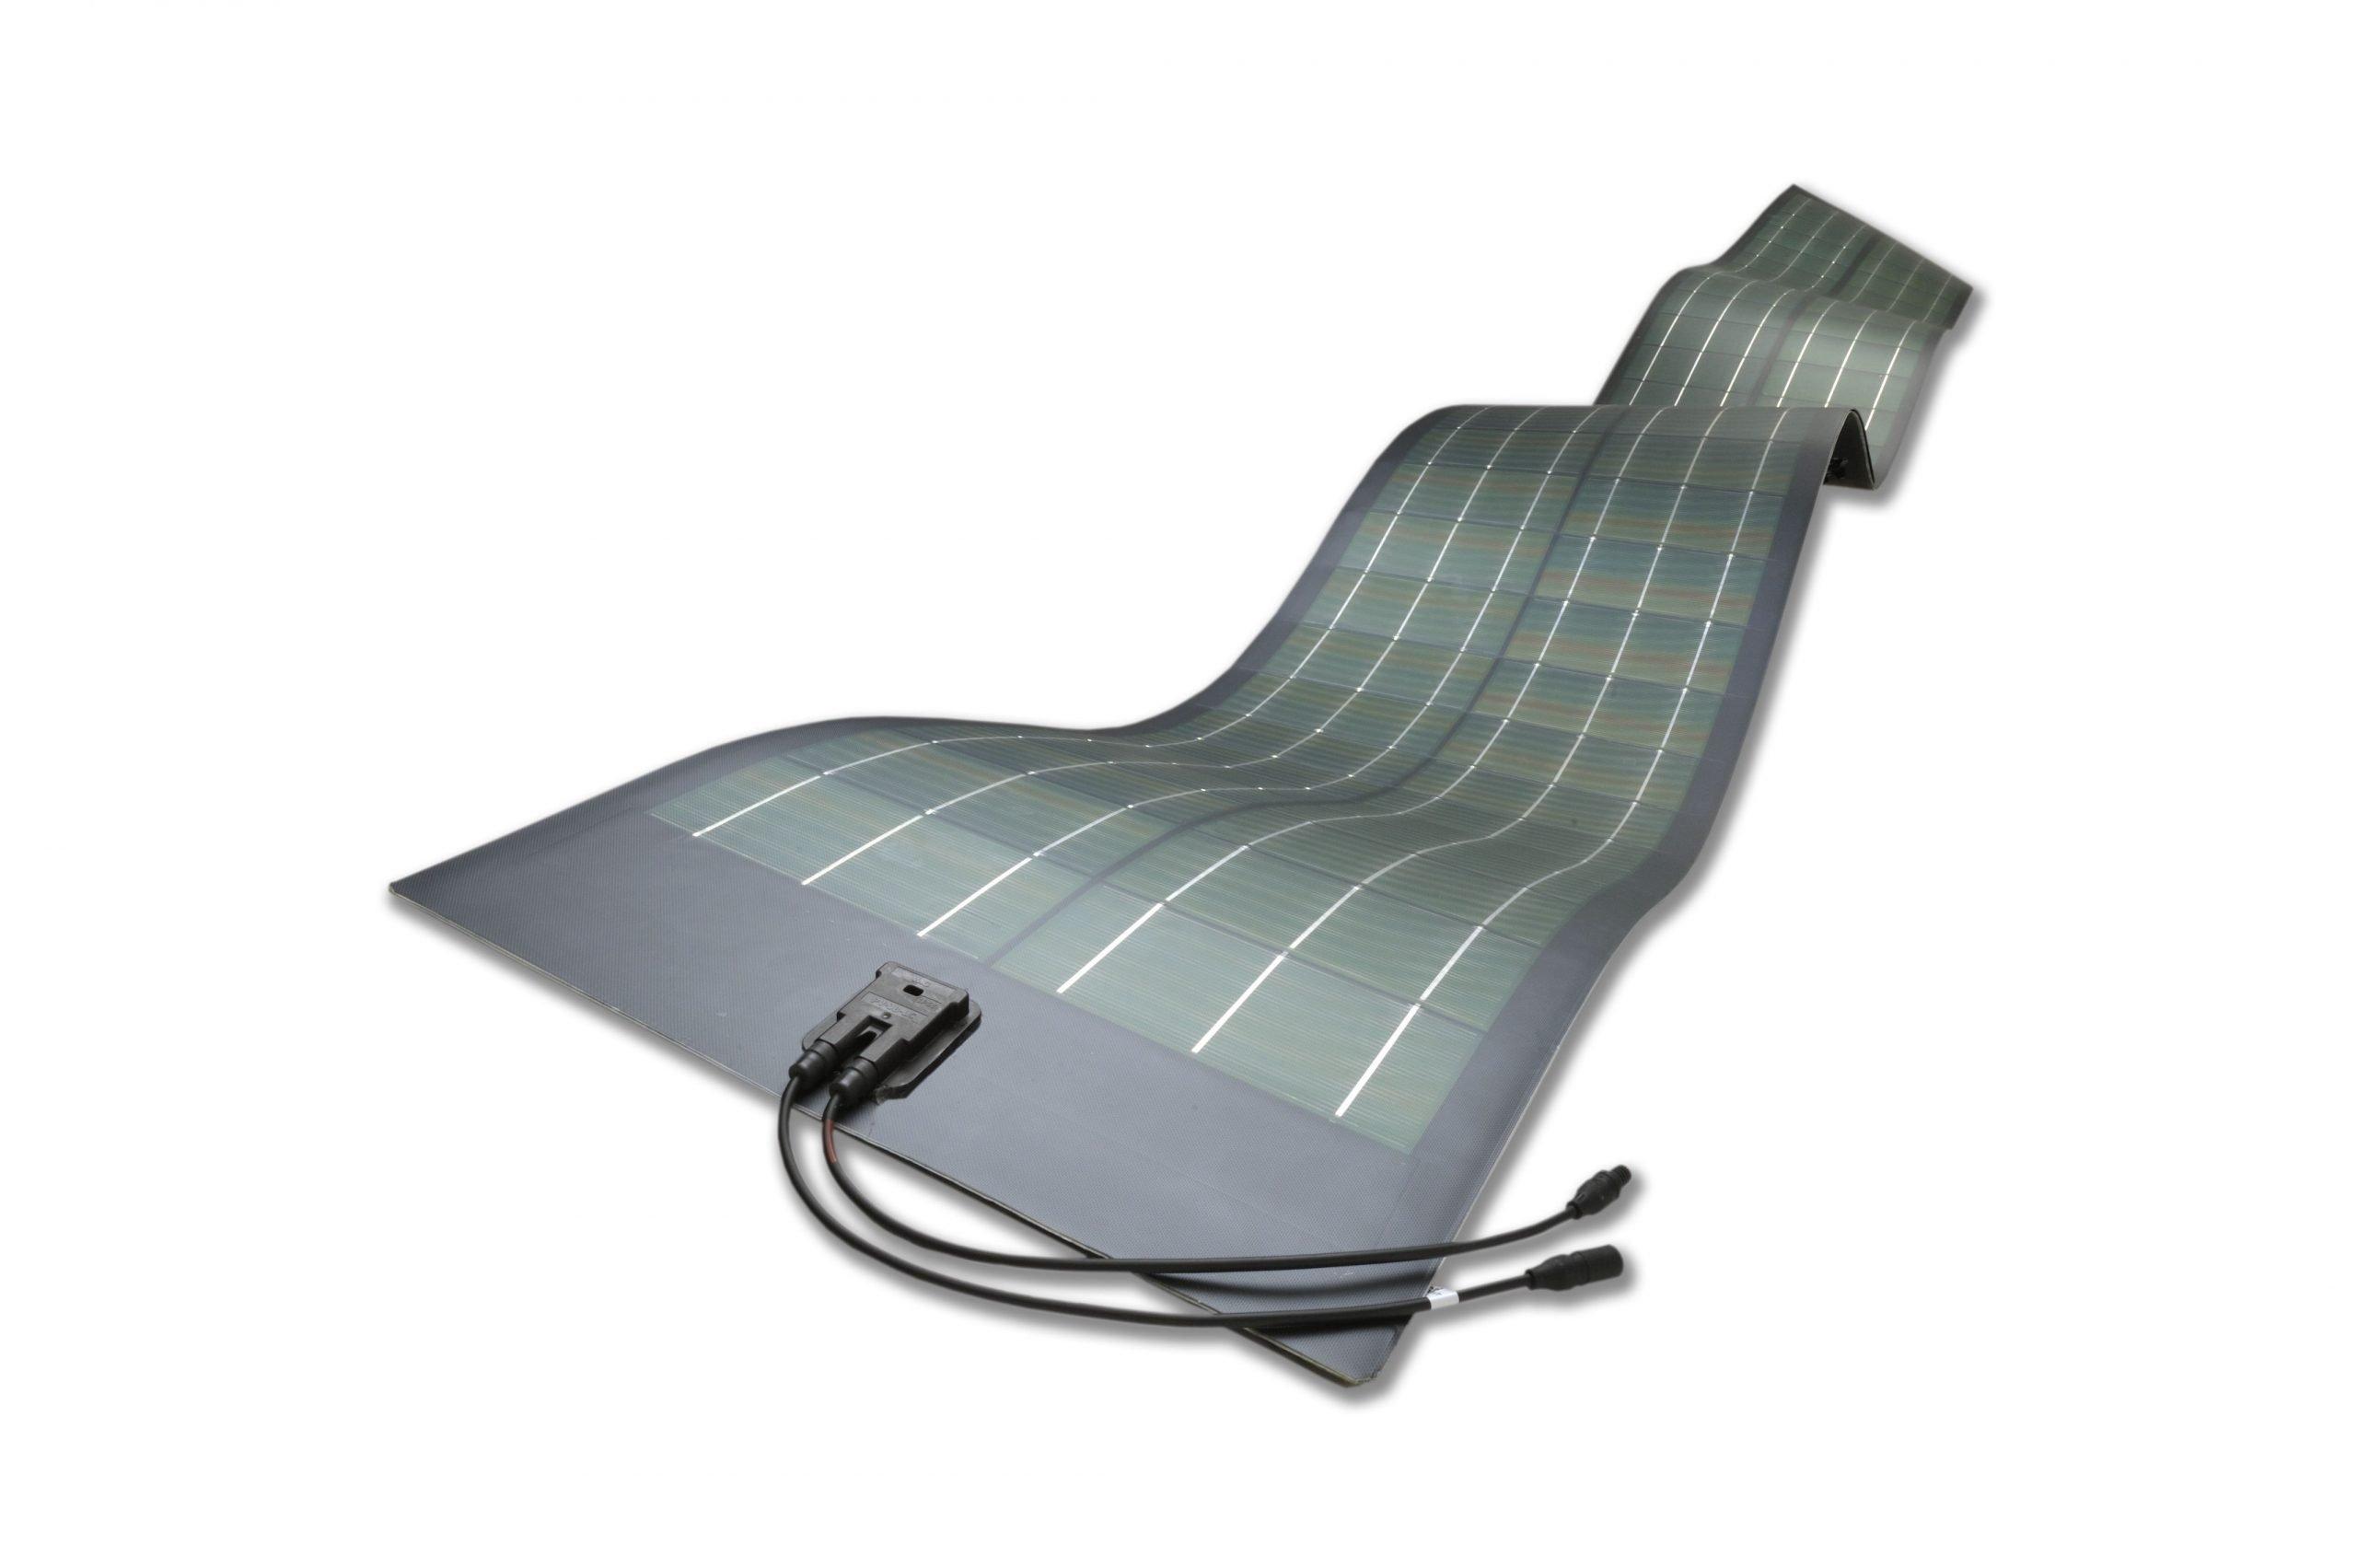 CIGS solar cells